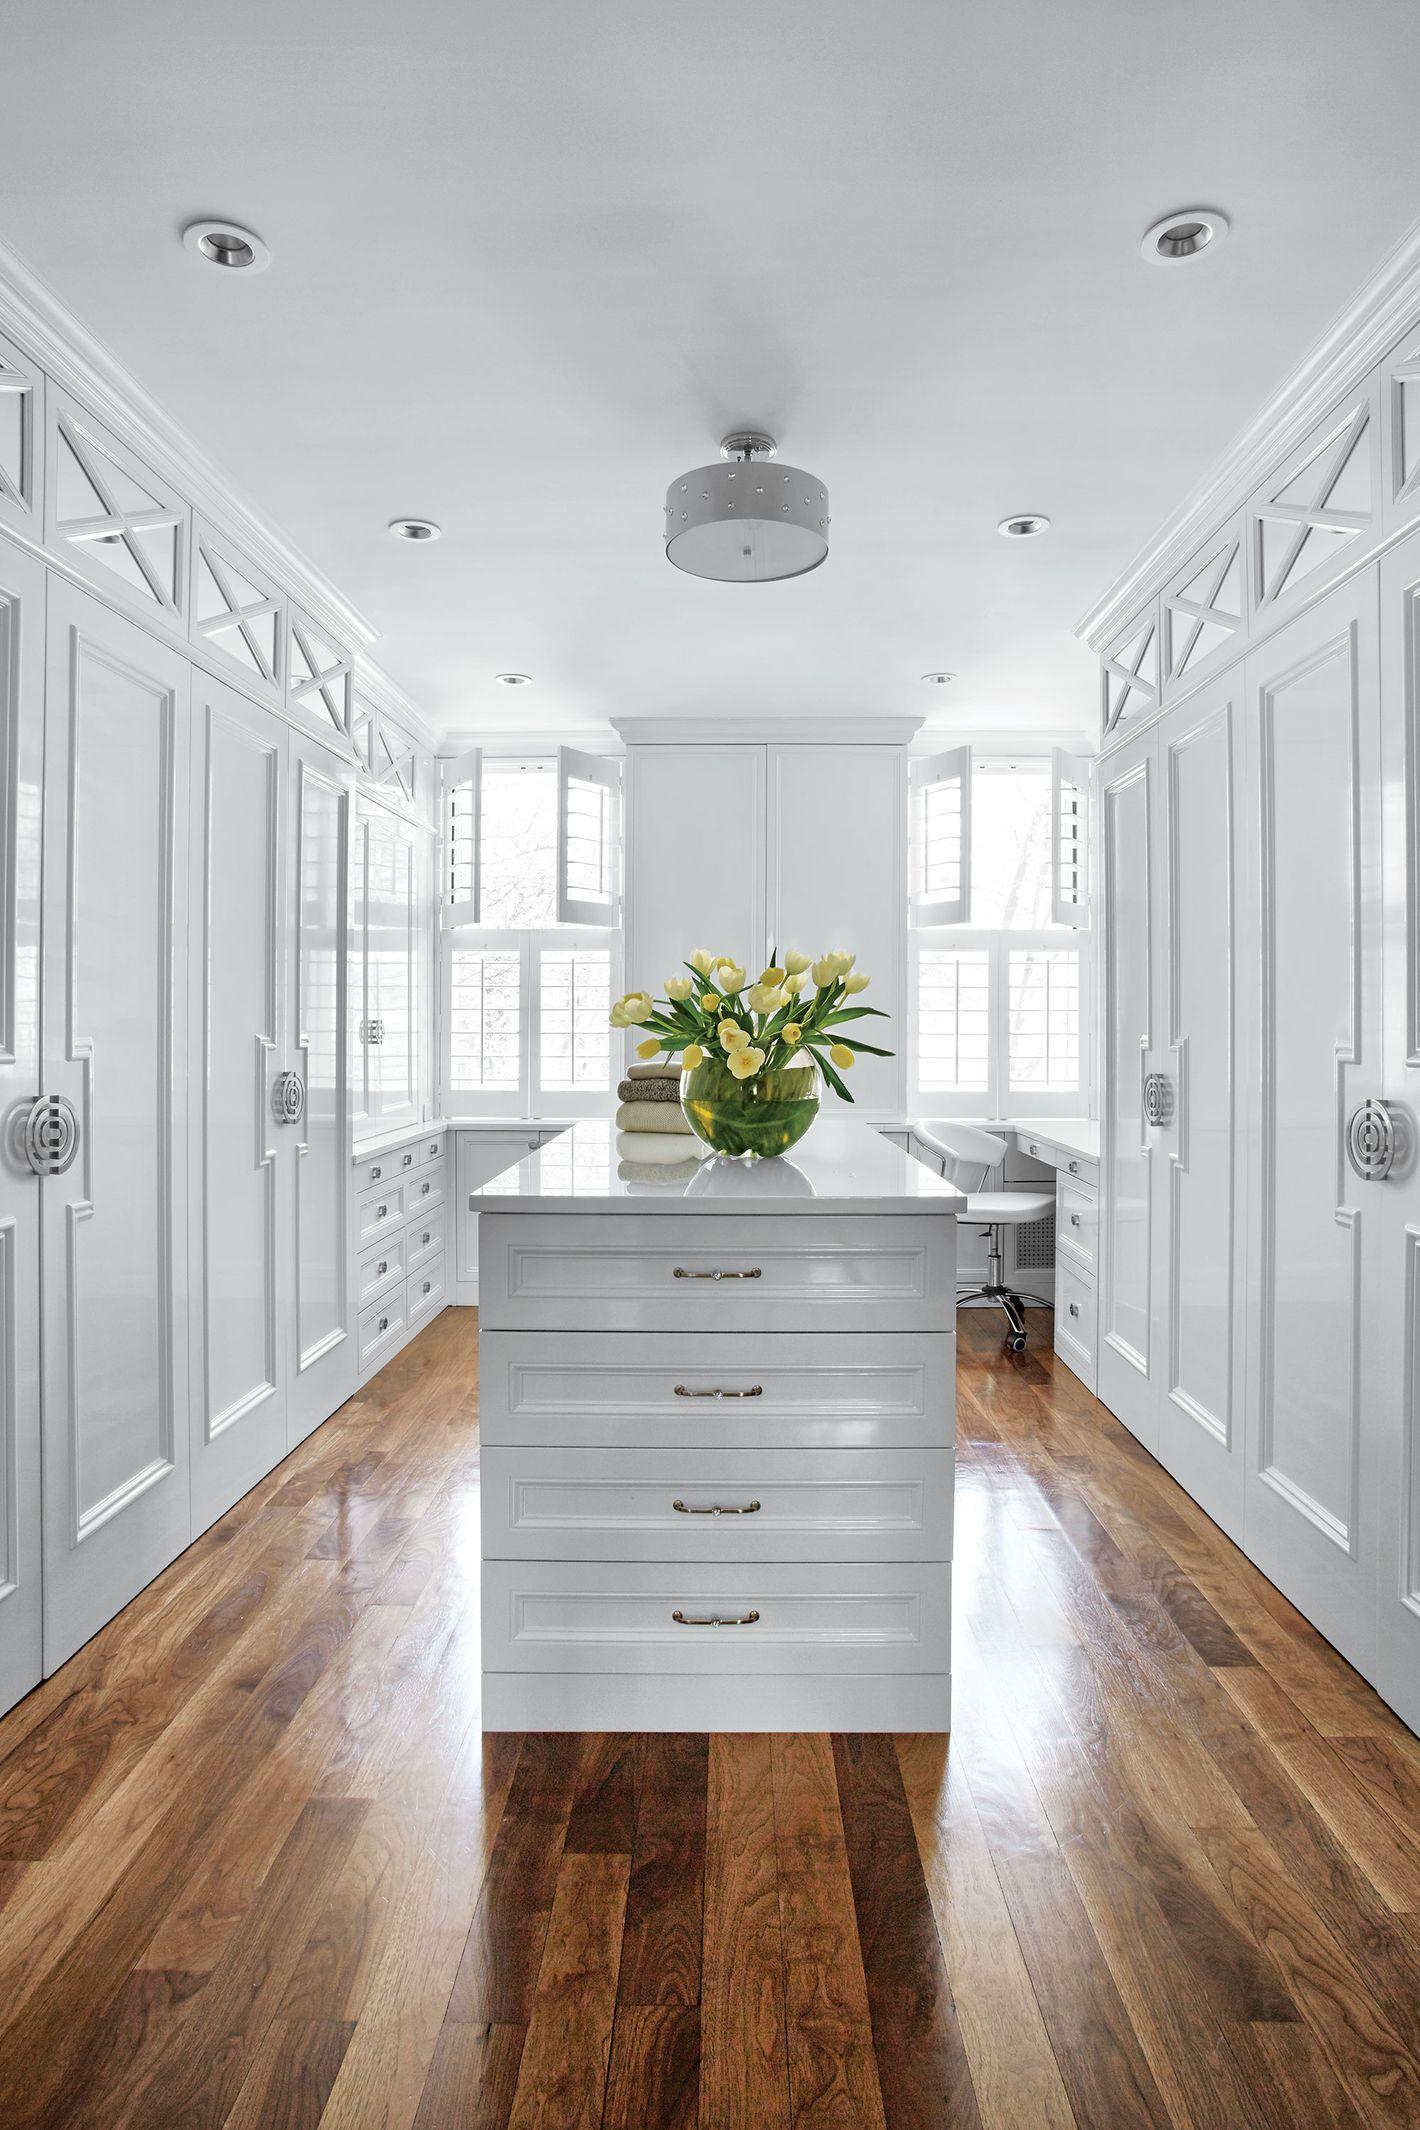 Haverk Interior Design 5 home design industry insiders their expert tips